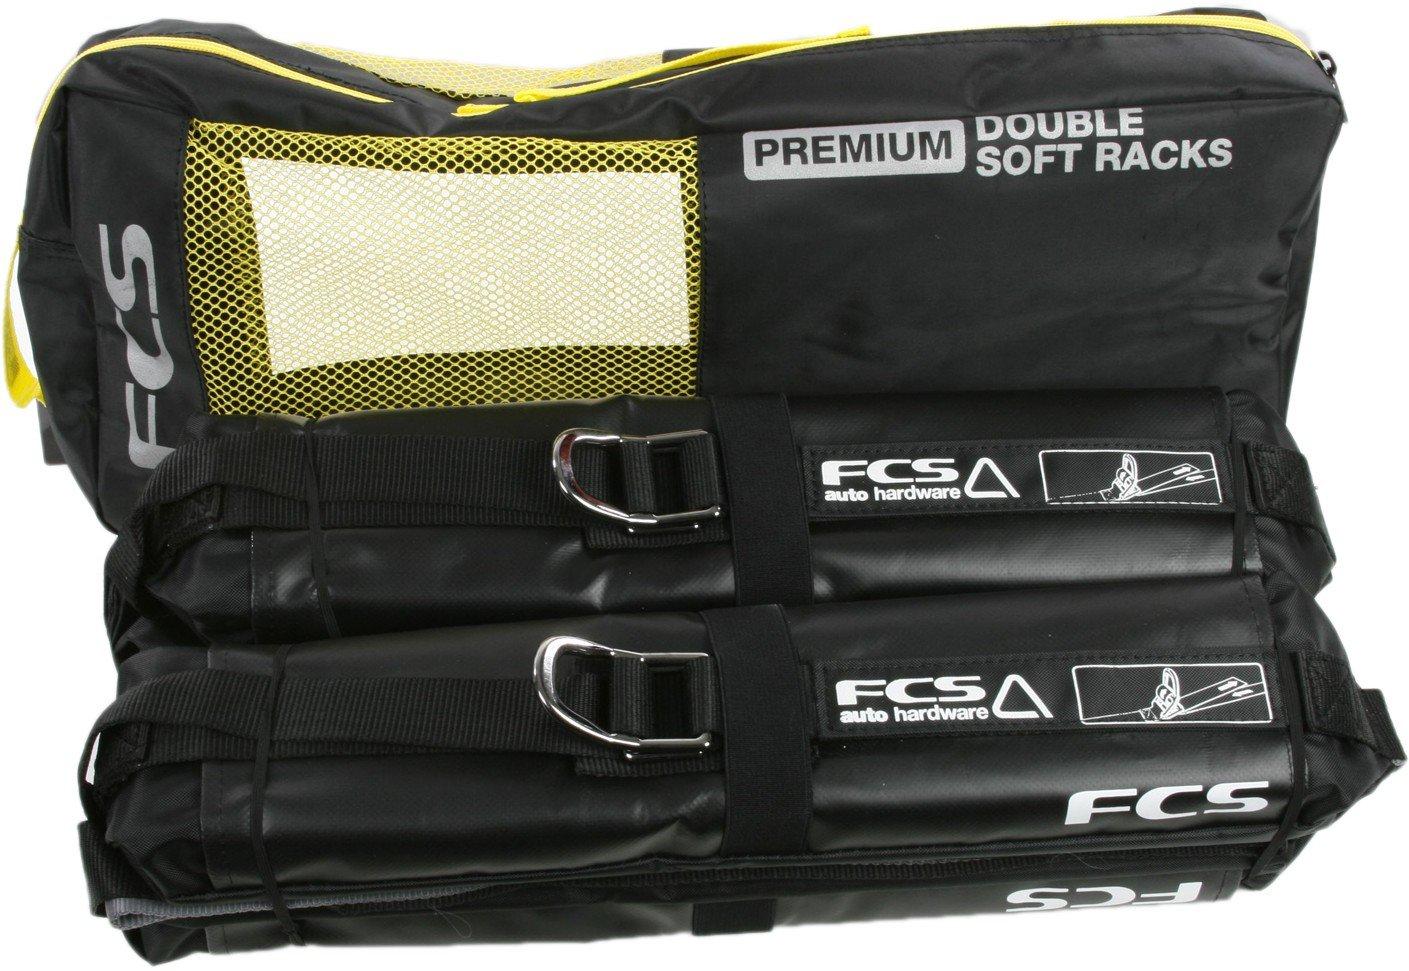 FCS Premium Double Soft Surfboard Car Racks 1900-550-00A